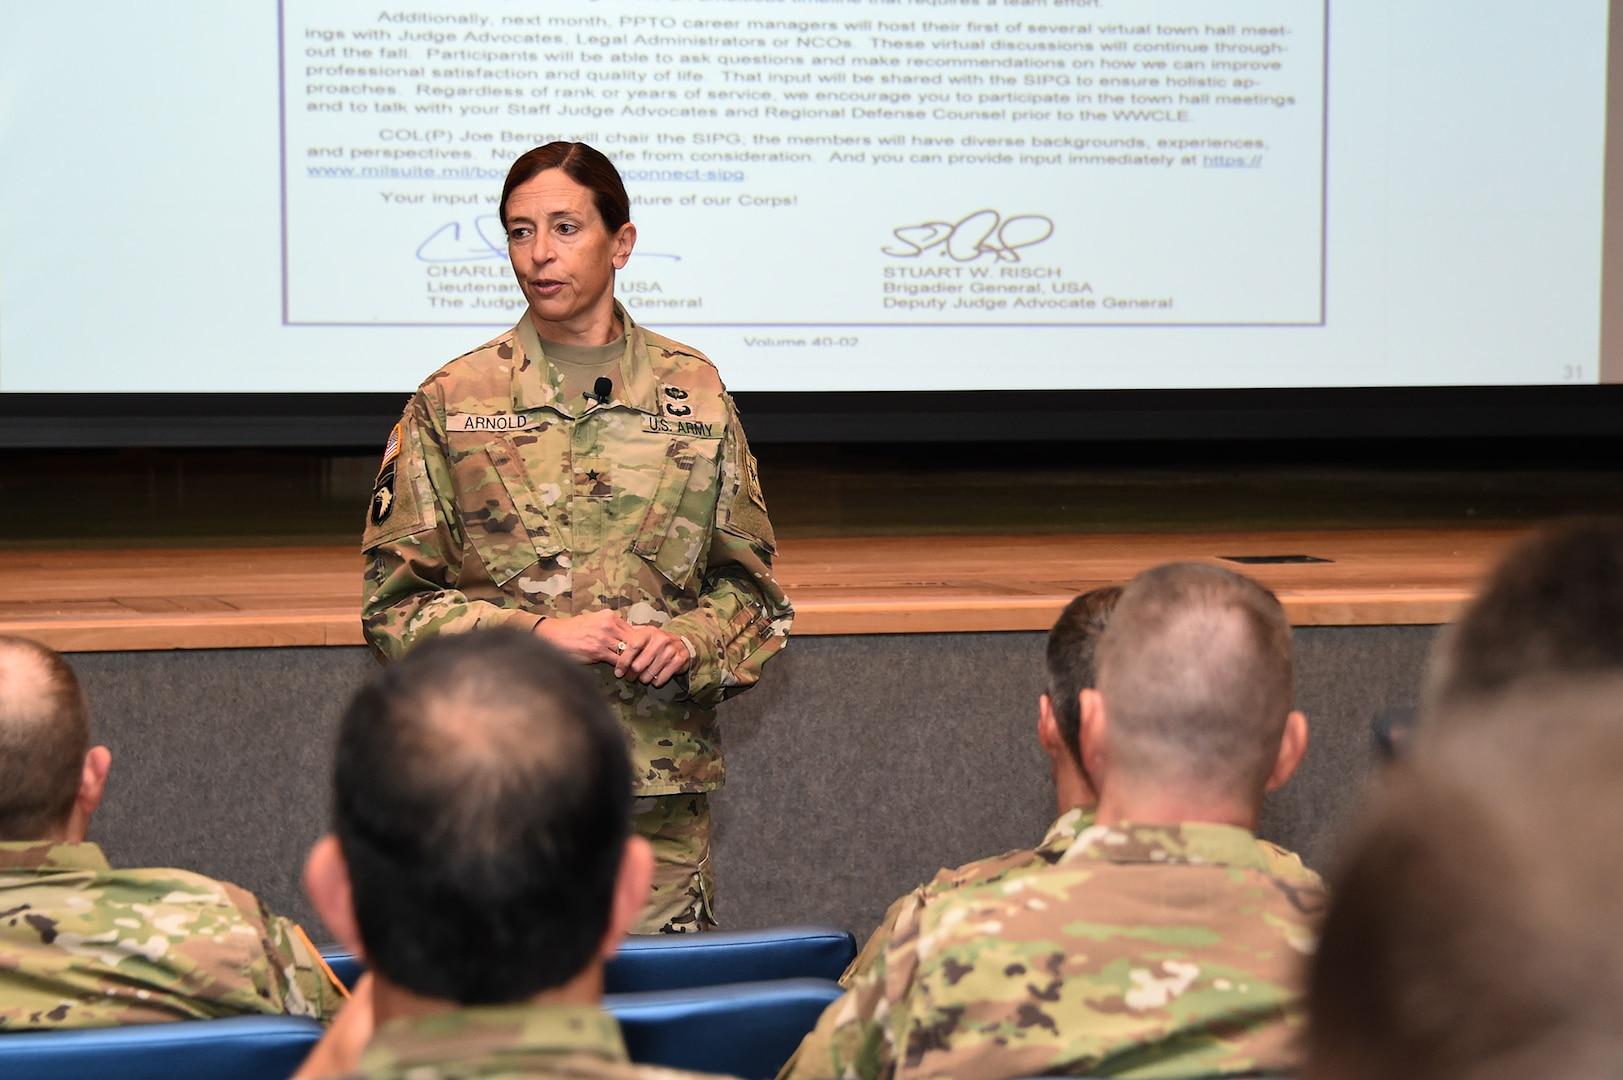 U.S. Strategic Command hosts Advanced Operational Law Conference